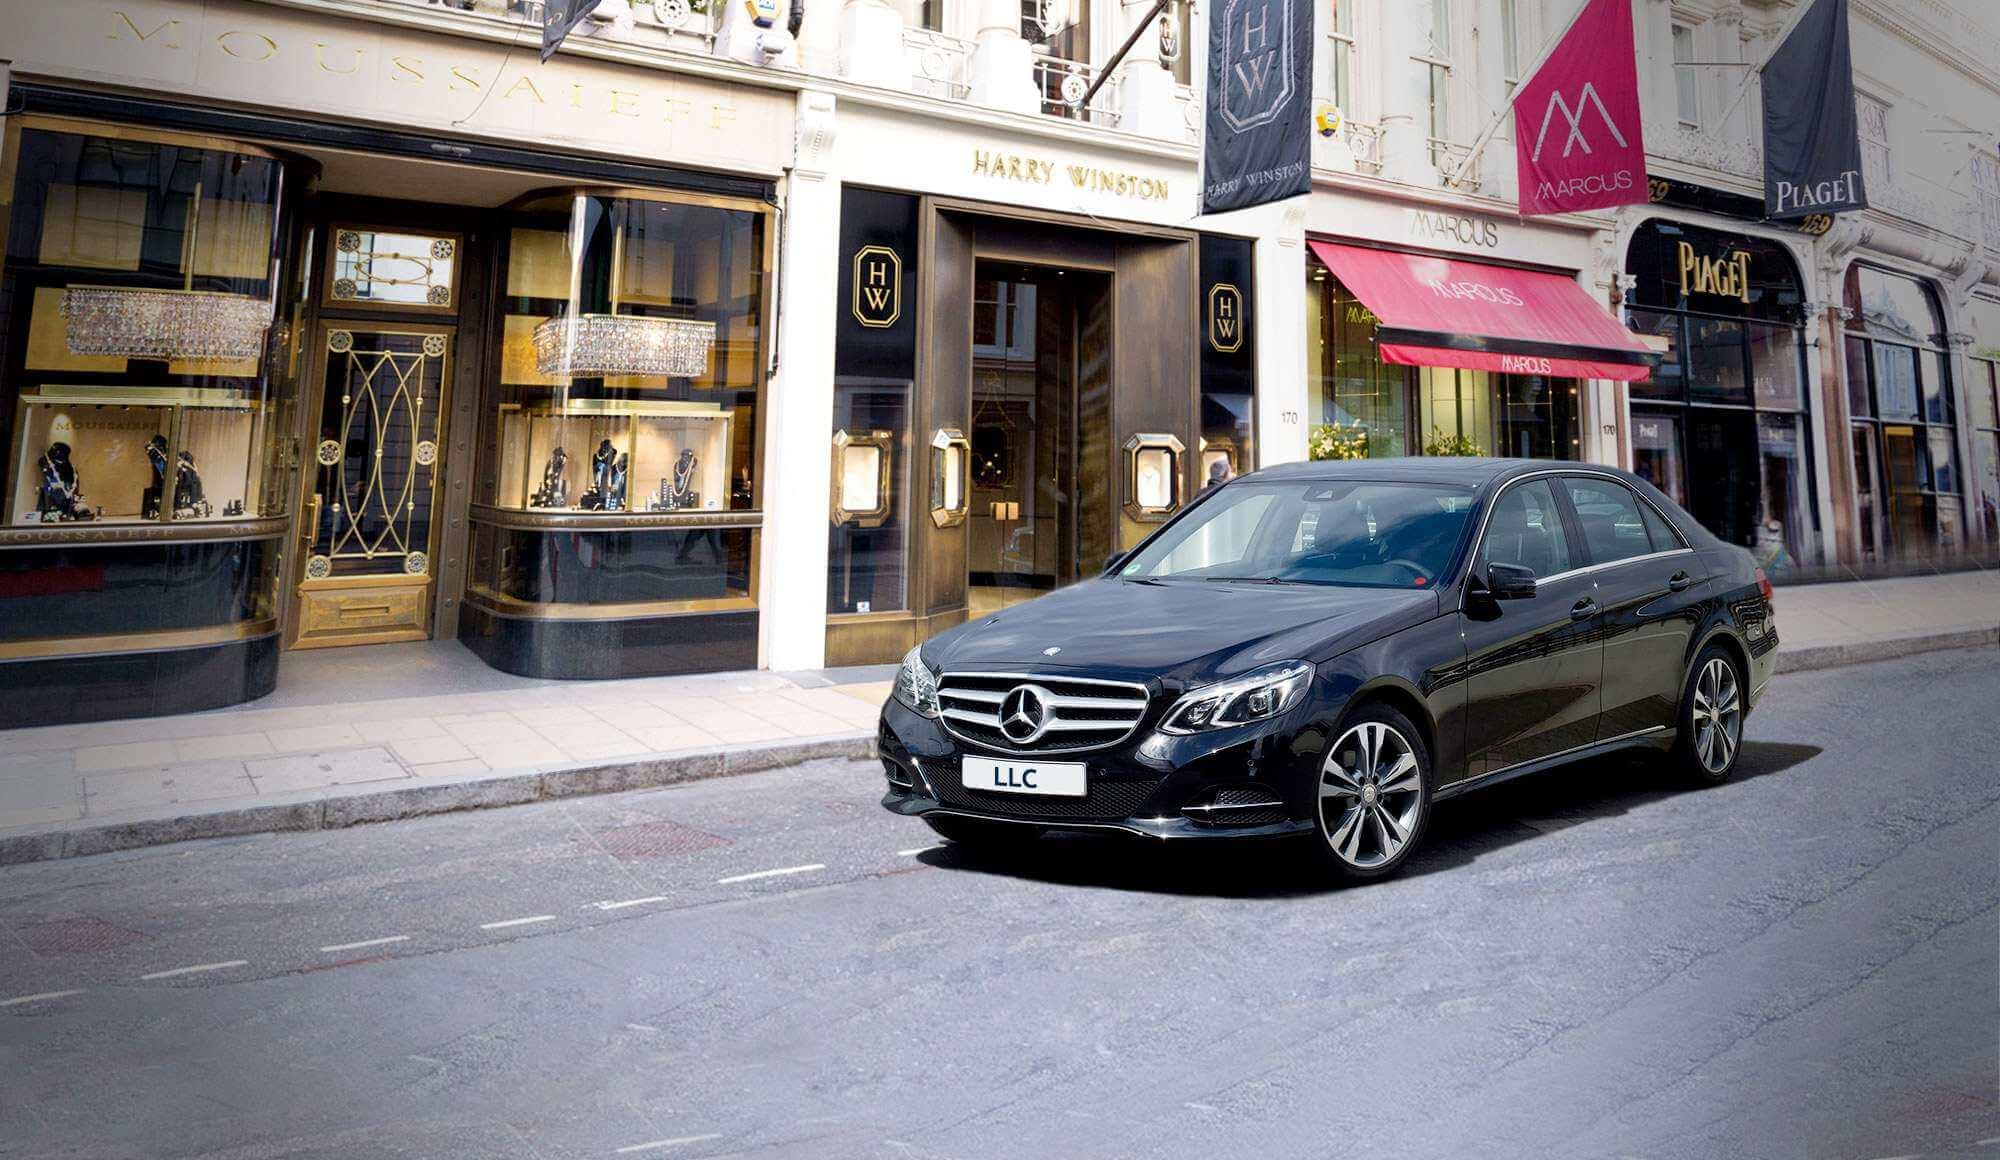 Mercedes E Class Hire With Chauffeur in London | LLC